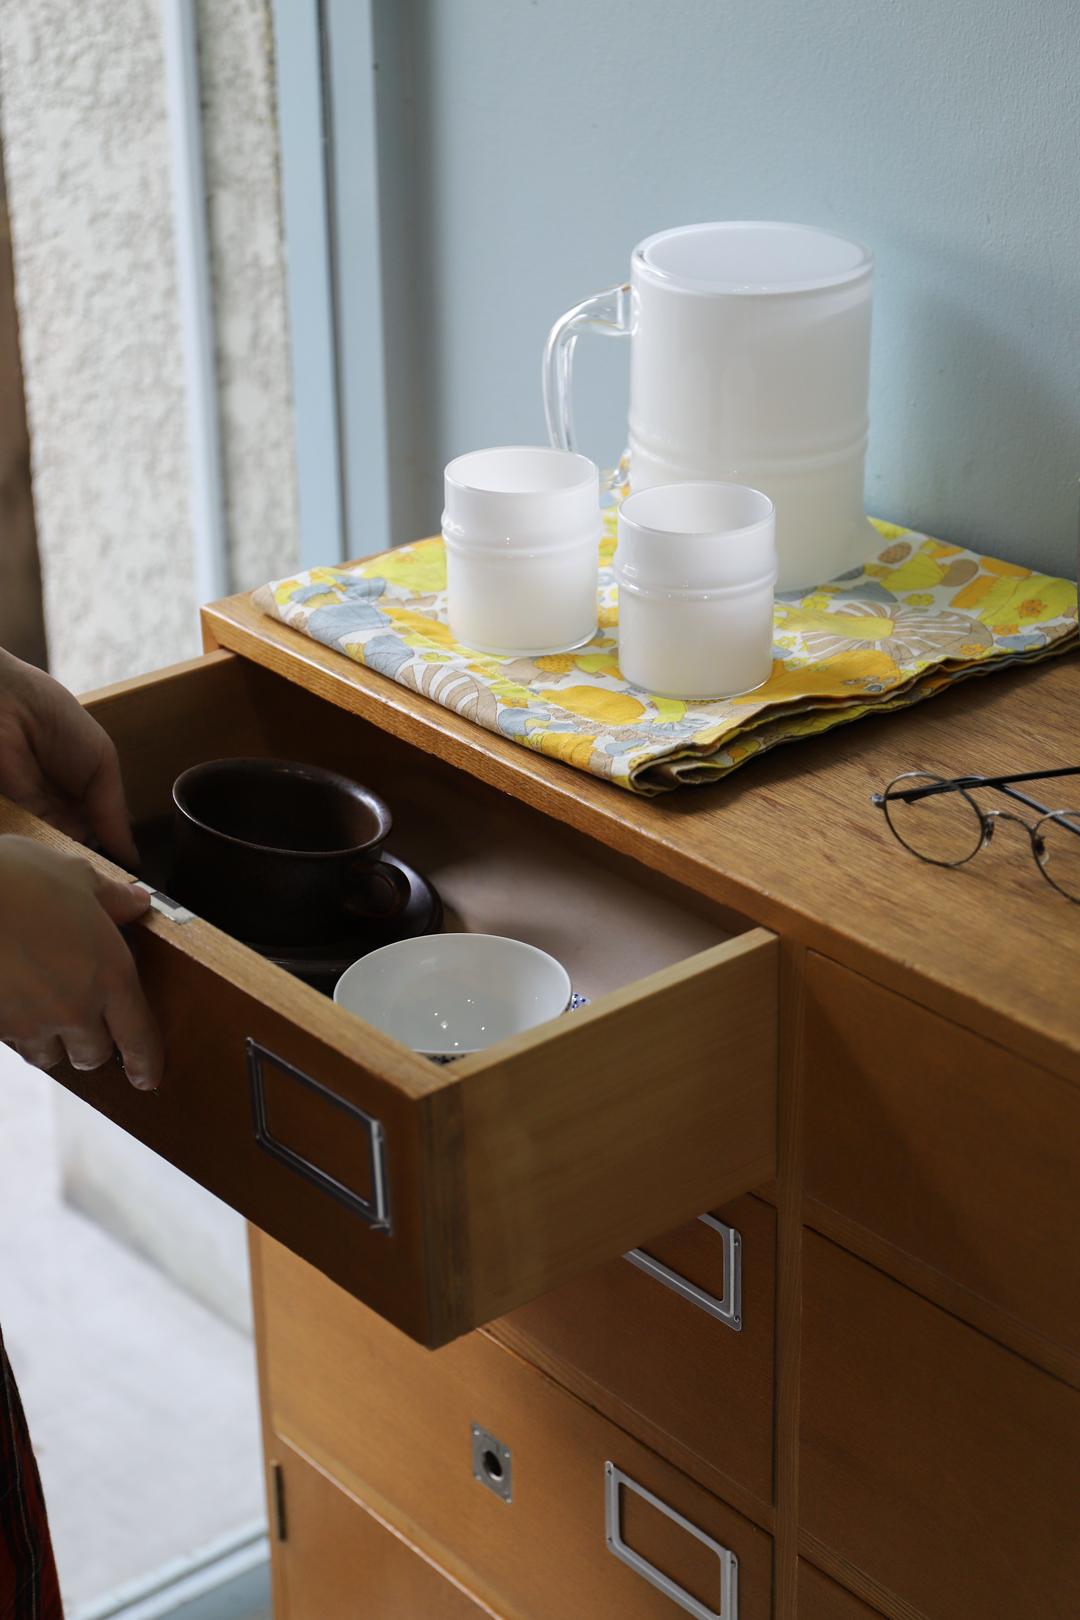 Multi Drawer Storage Cabinet/マルチキャビネット 引き出し 収納 チェスト オーク材 2